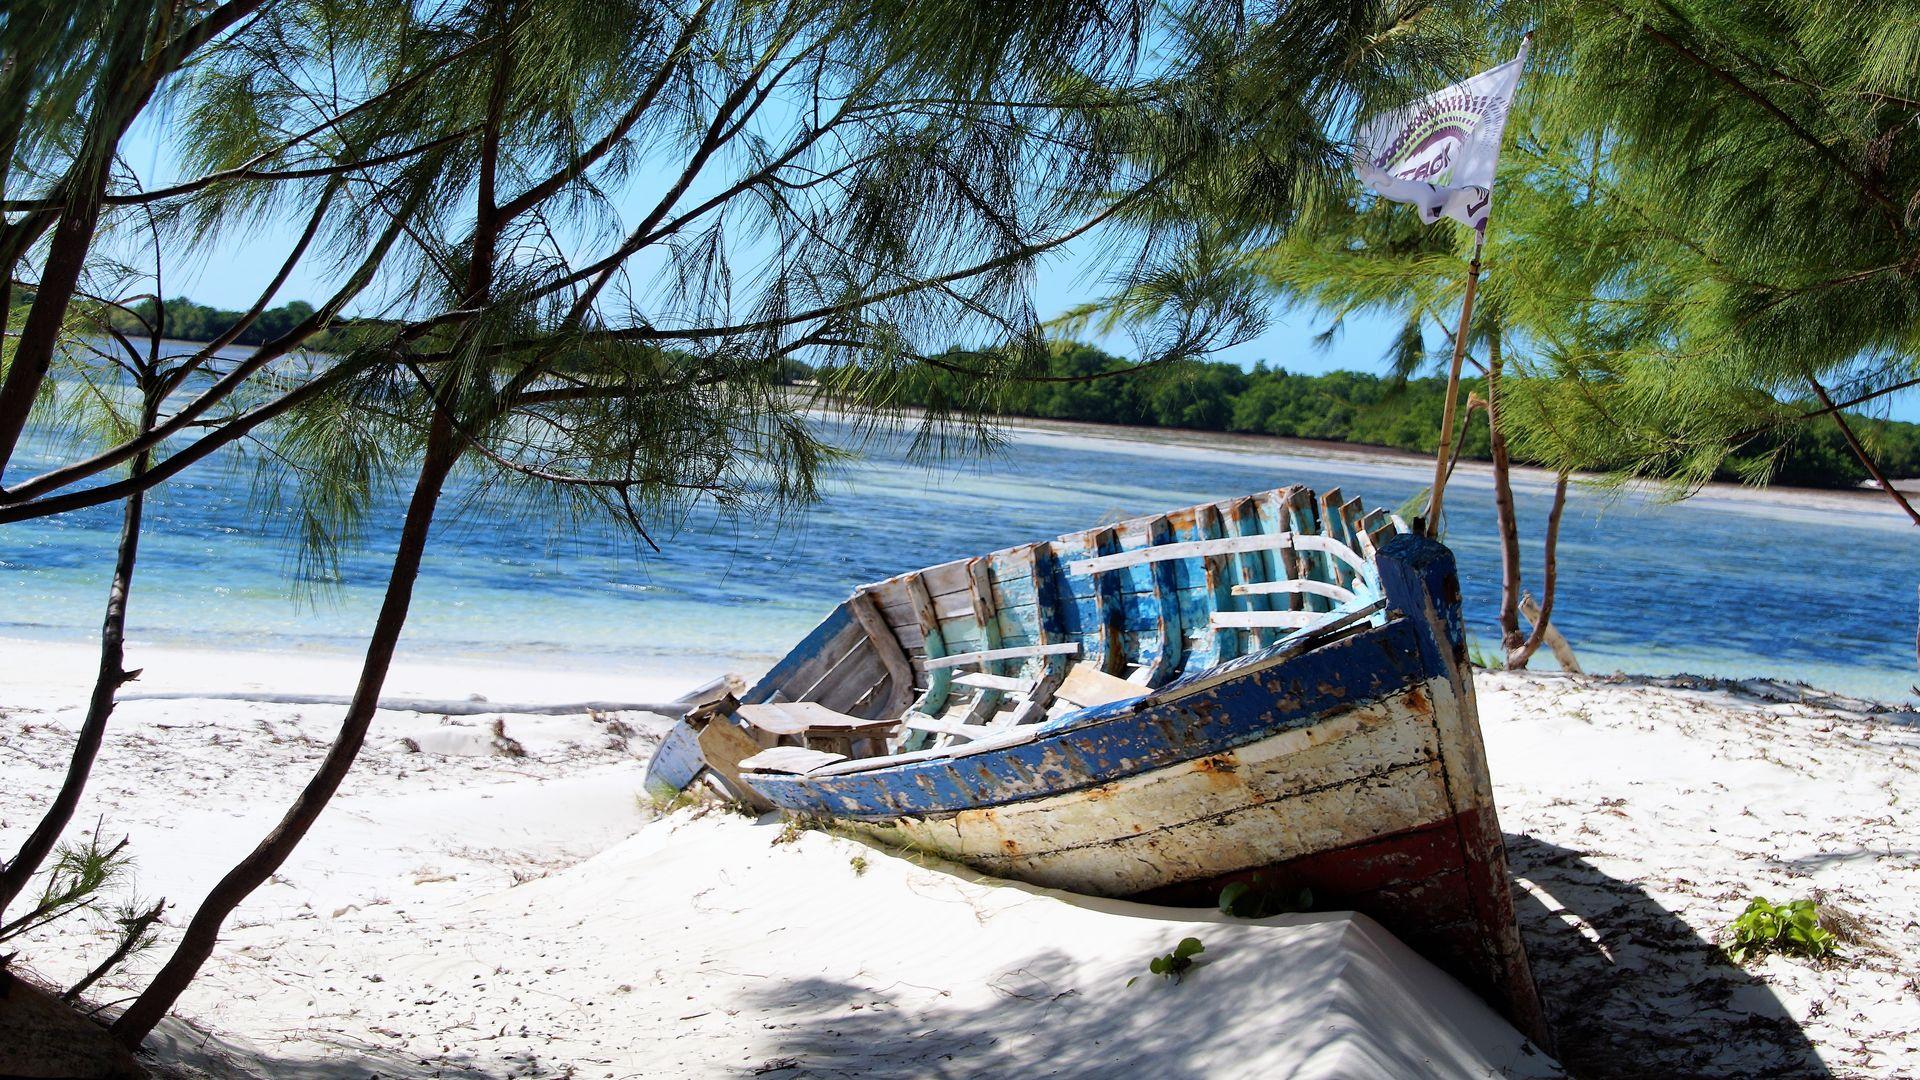 Diego suarez - 3 baaien wandeling - madagascar reizen